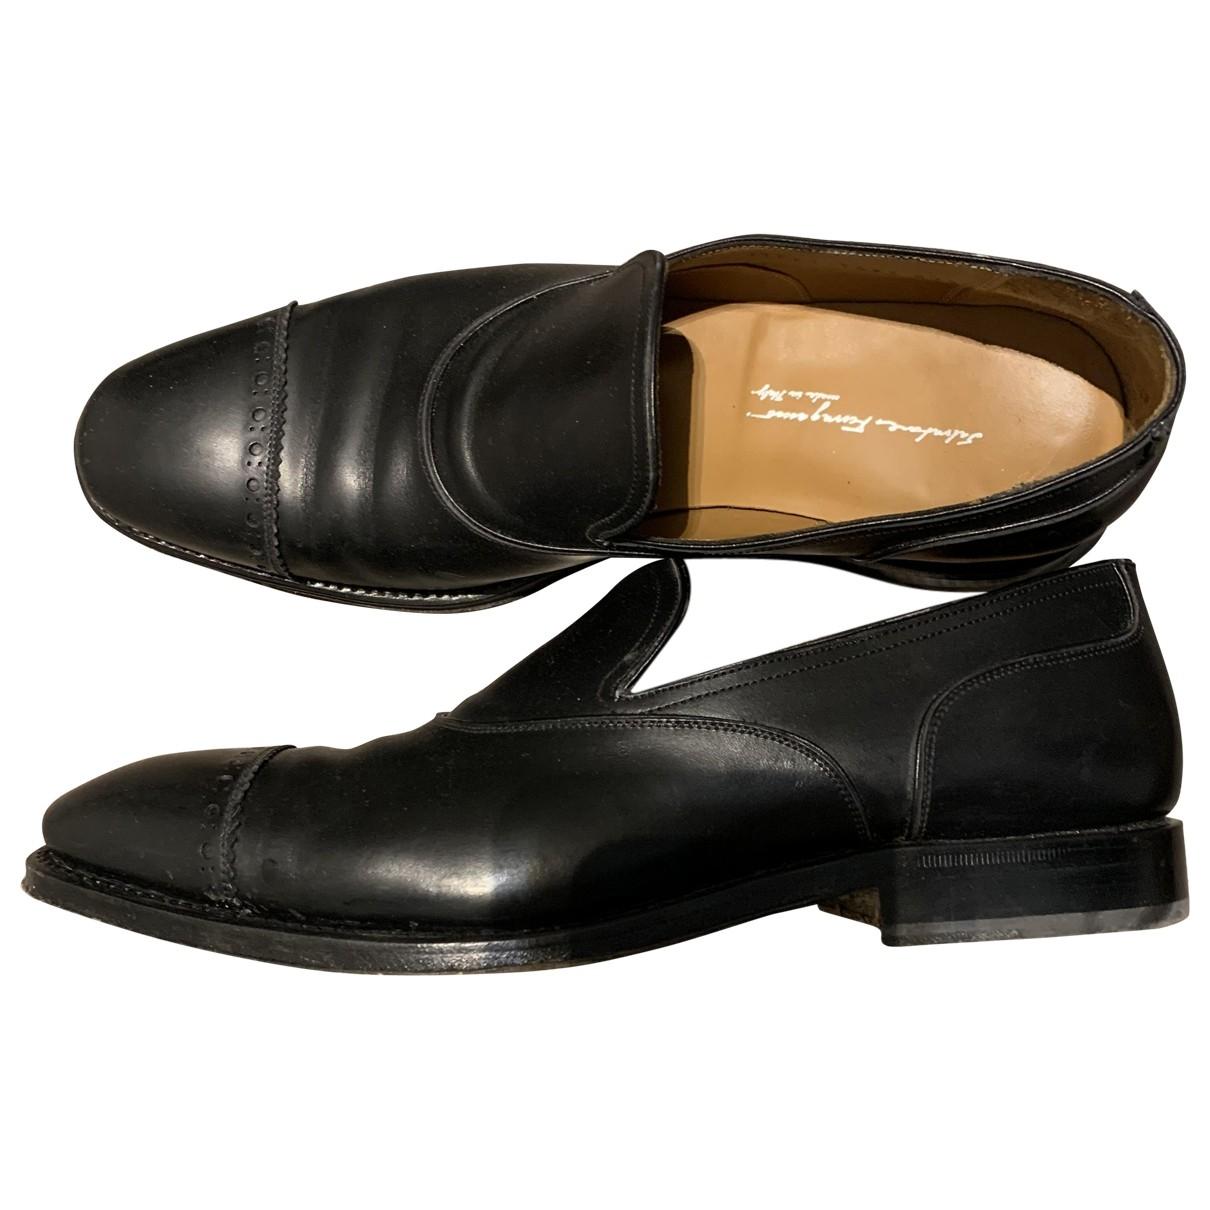 Salvatore Ferragamo \N Black Leather Flats for Men 42.5 EU